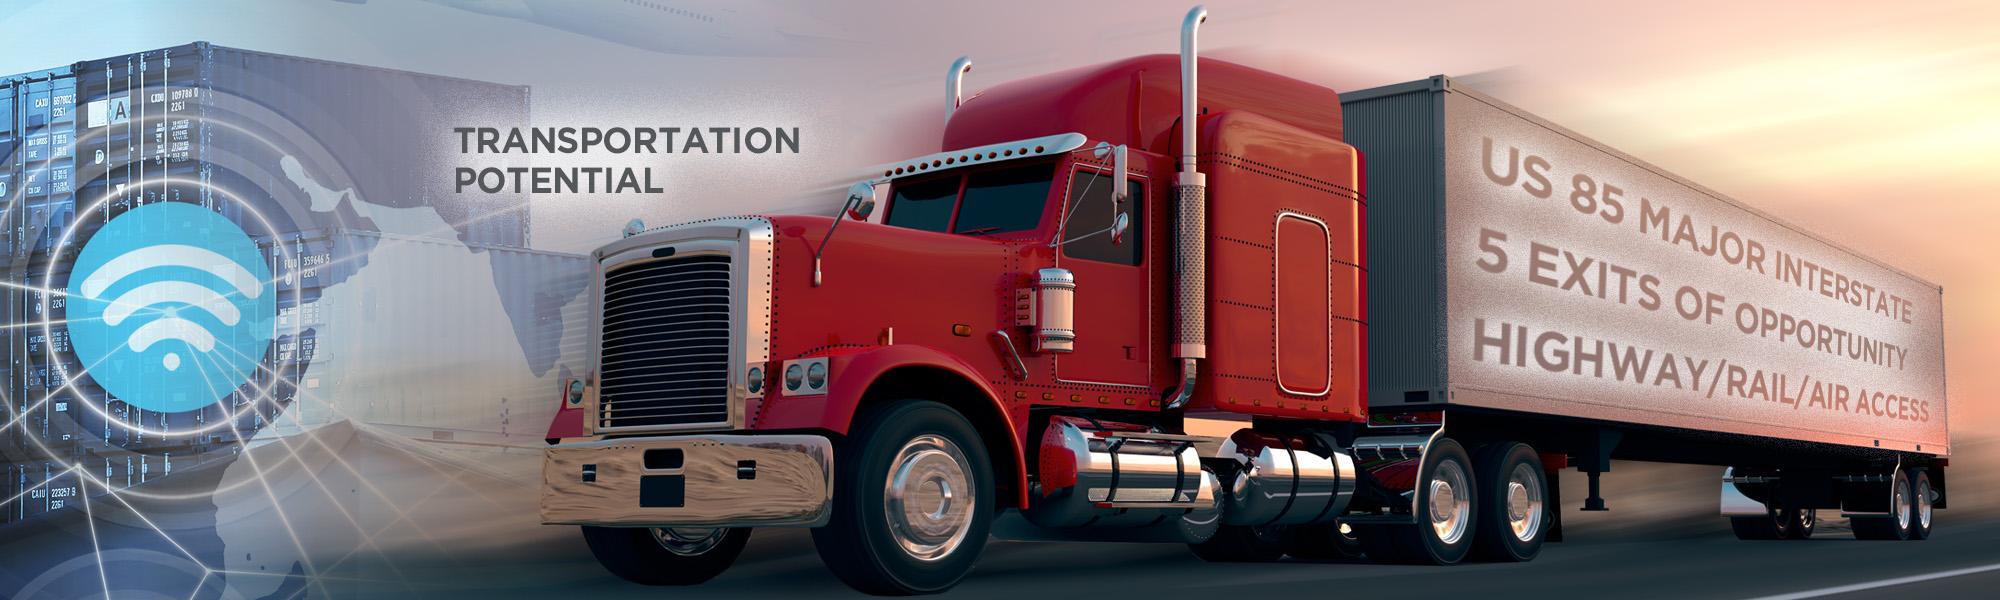 Trucking_Logistics_Banner_Image